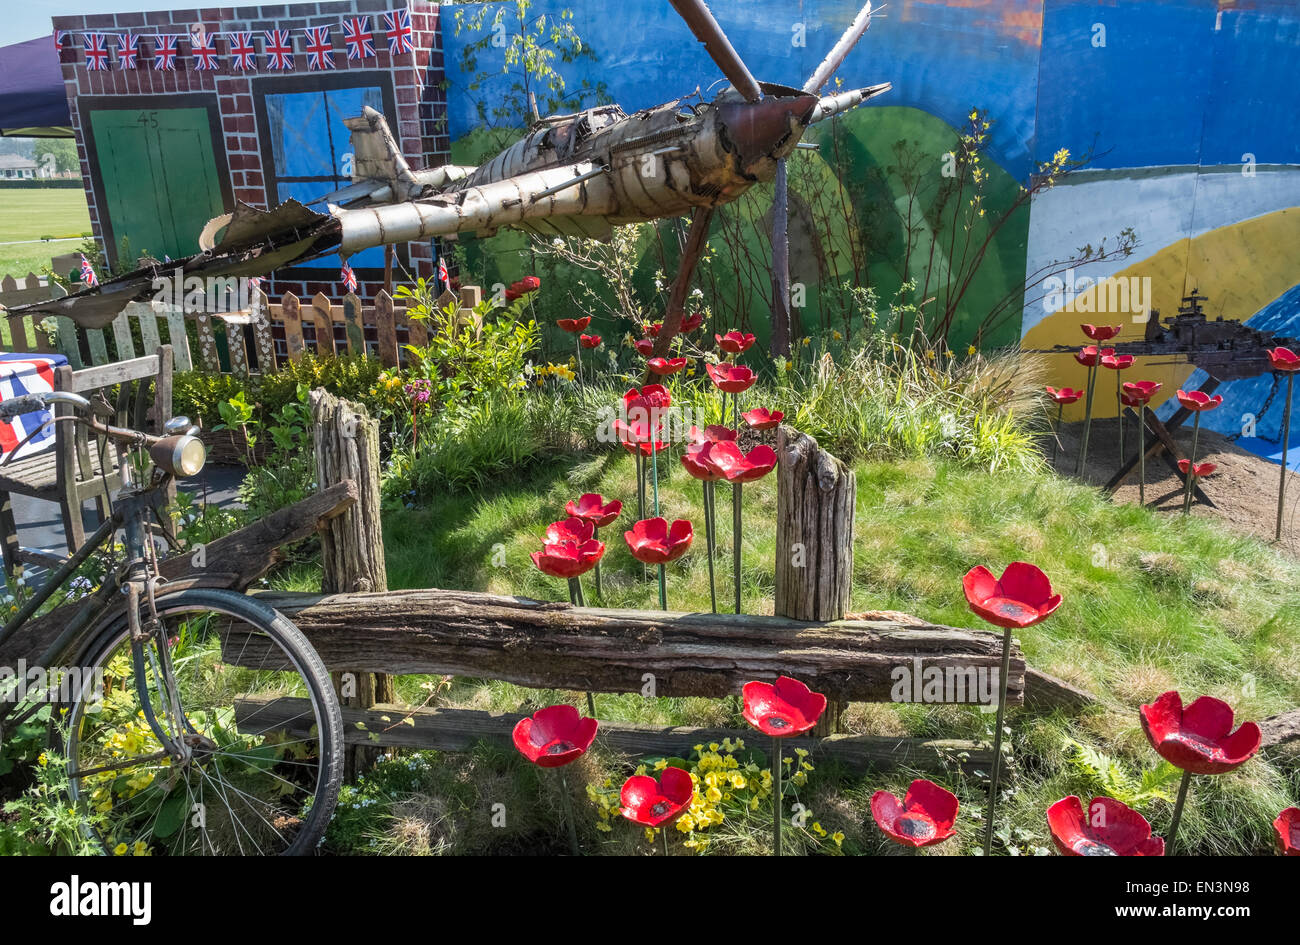 Garden design with world war 2 theme at harrogate spring for Garden design harrogate